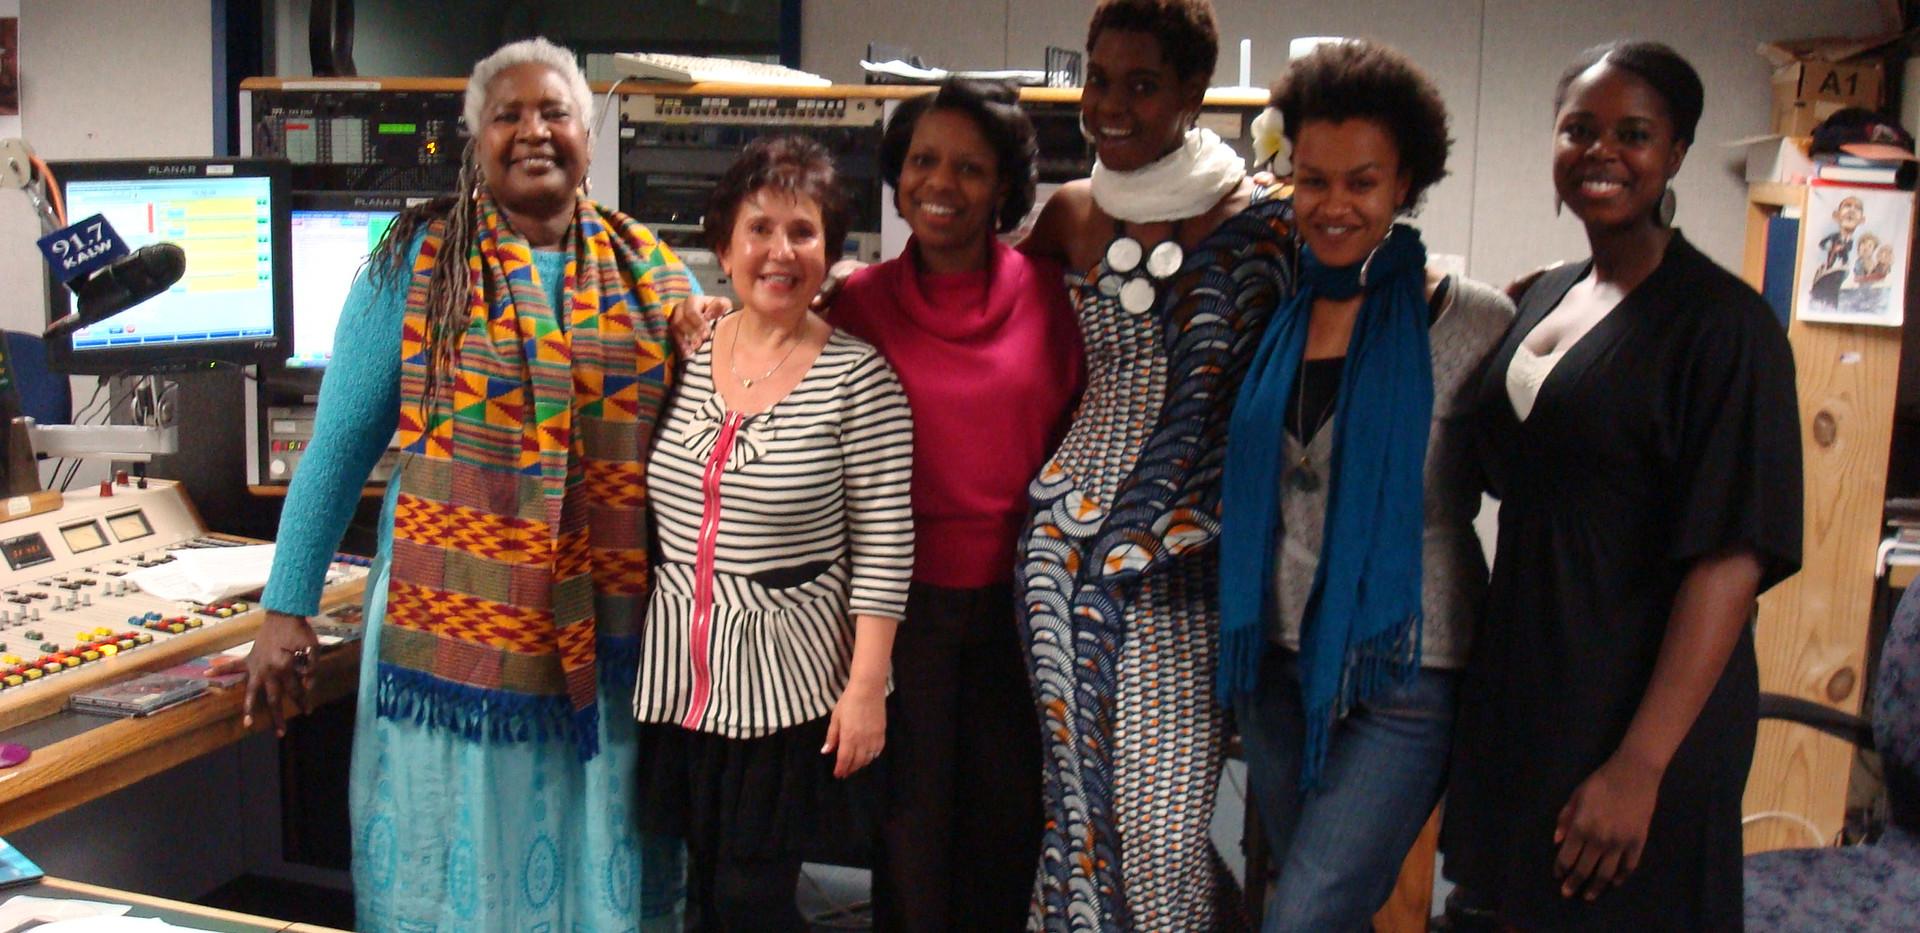 International Women Day, bay area women artists on  Africamix. from left to right, Bobby Cespedes,Raquel Biton,Muadi Mukenge,Fely Tchaco, Meklit, Akosua